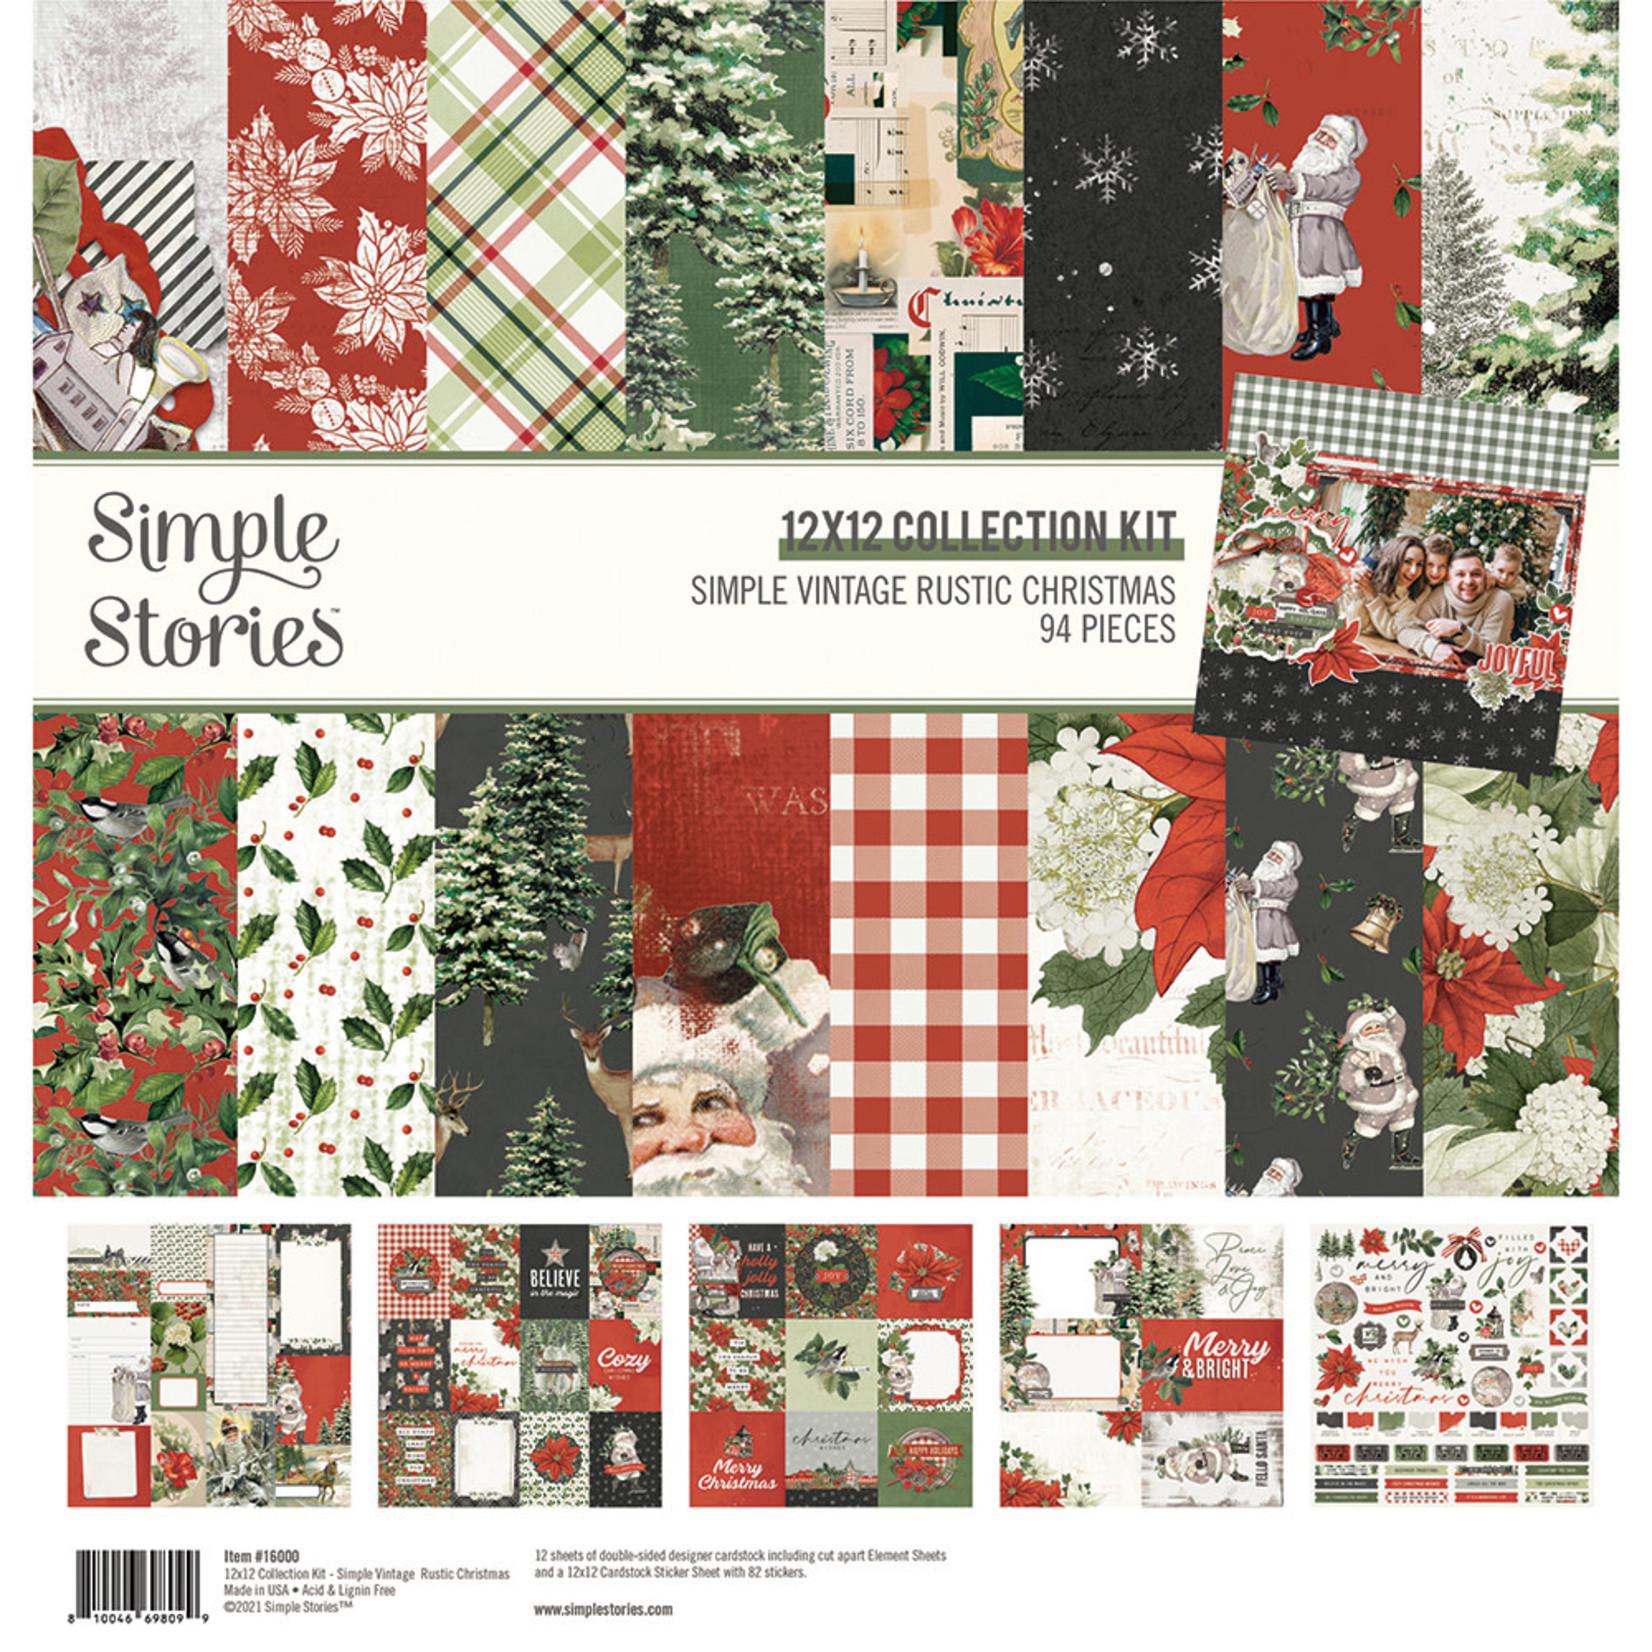 Simple Stories Simple Stories - Simple Vintage Rustic Christmas Collection - 12x12 Collection Kit